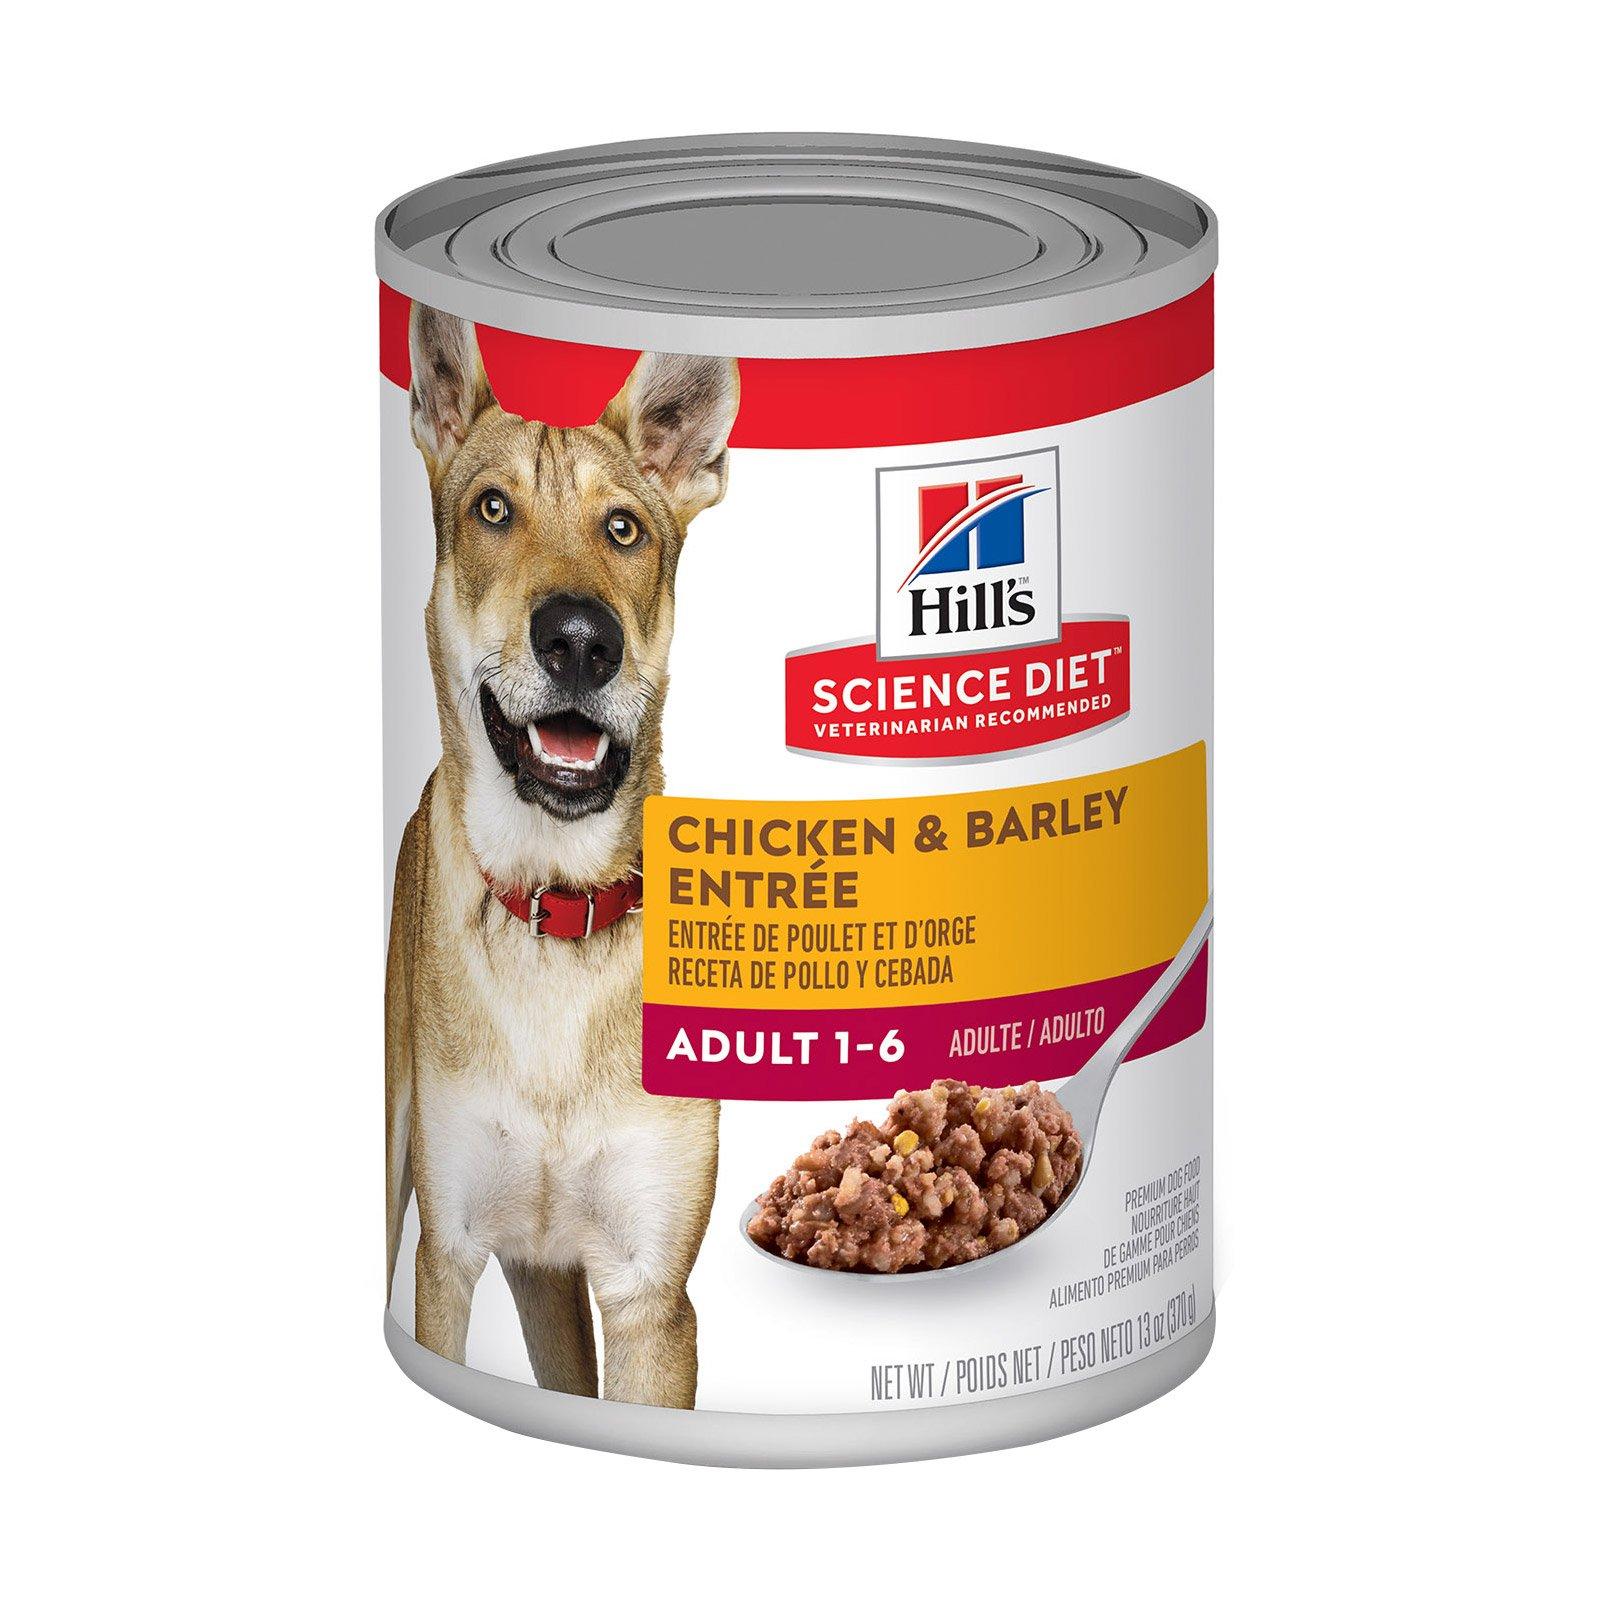 Hill's Science Diet Adult Chicken & Barley Entrée Canned Dog Food 370 Gm